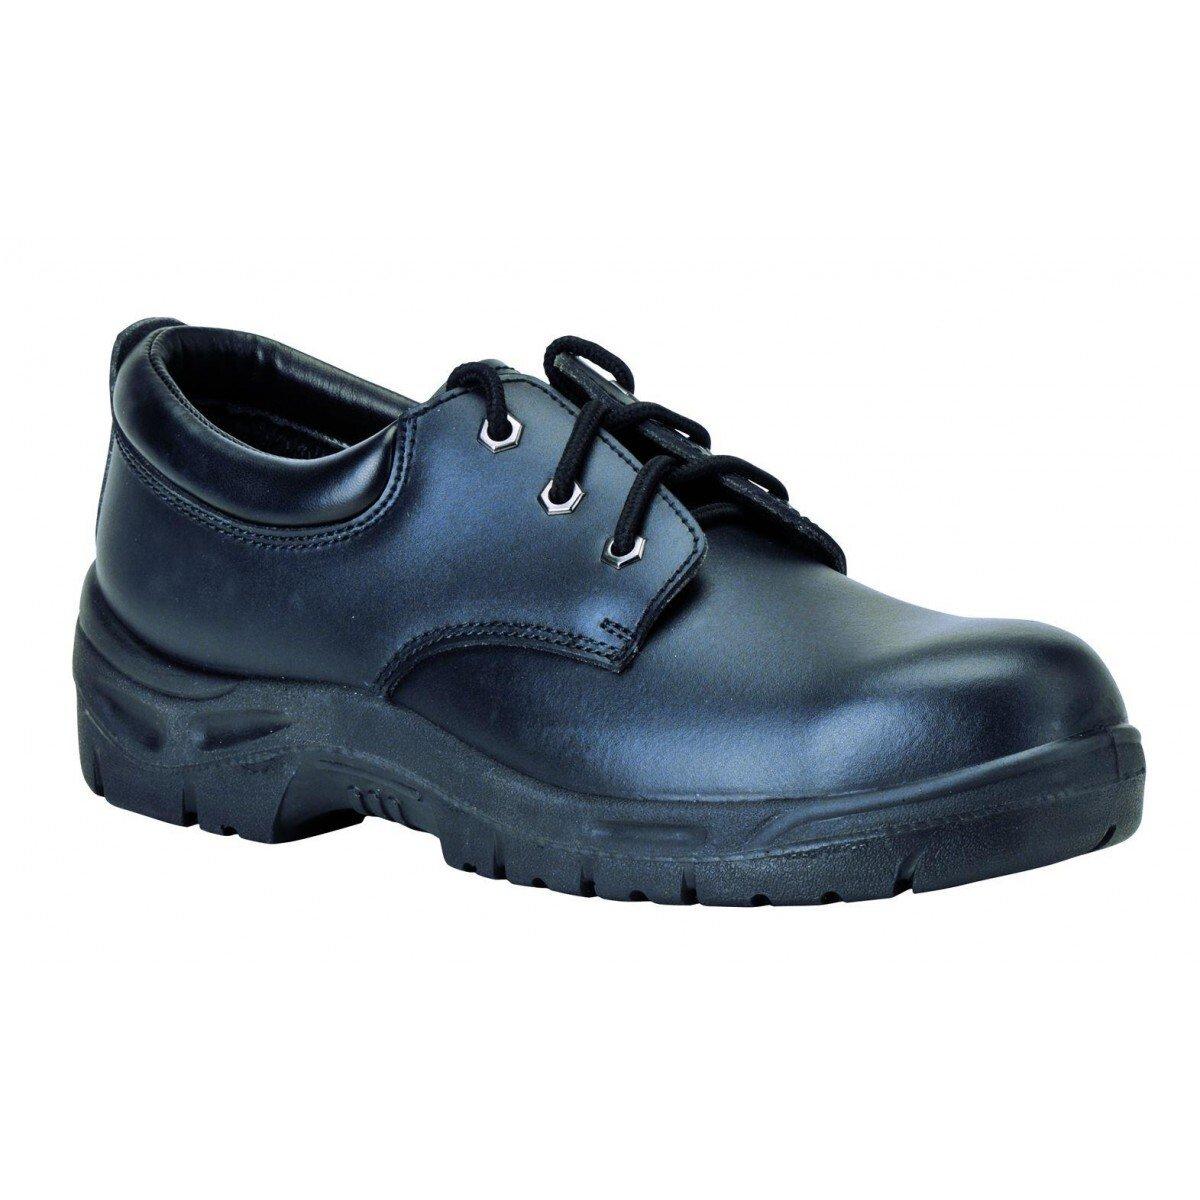 Portwest FW04 Steelite Shoe S3 - Black